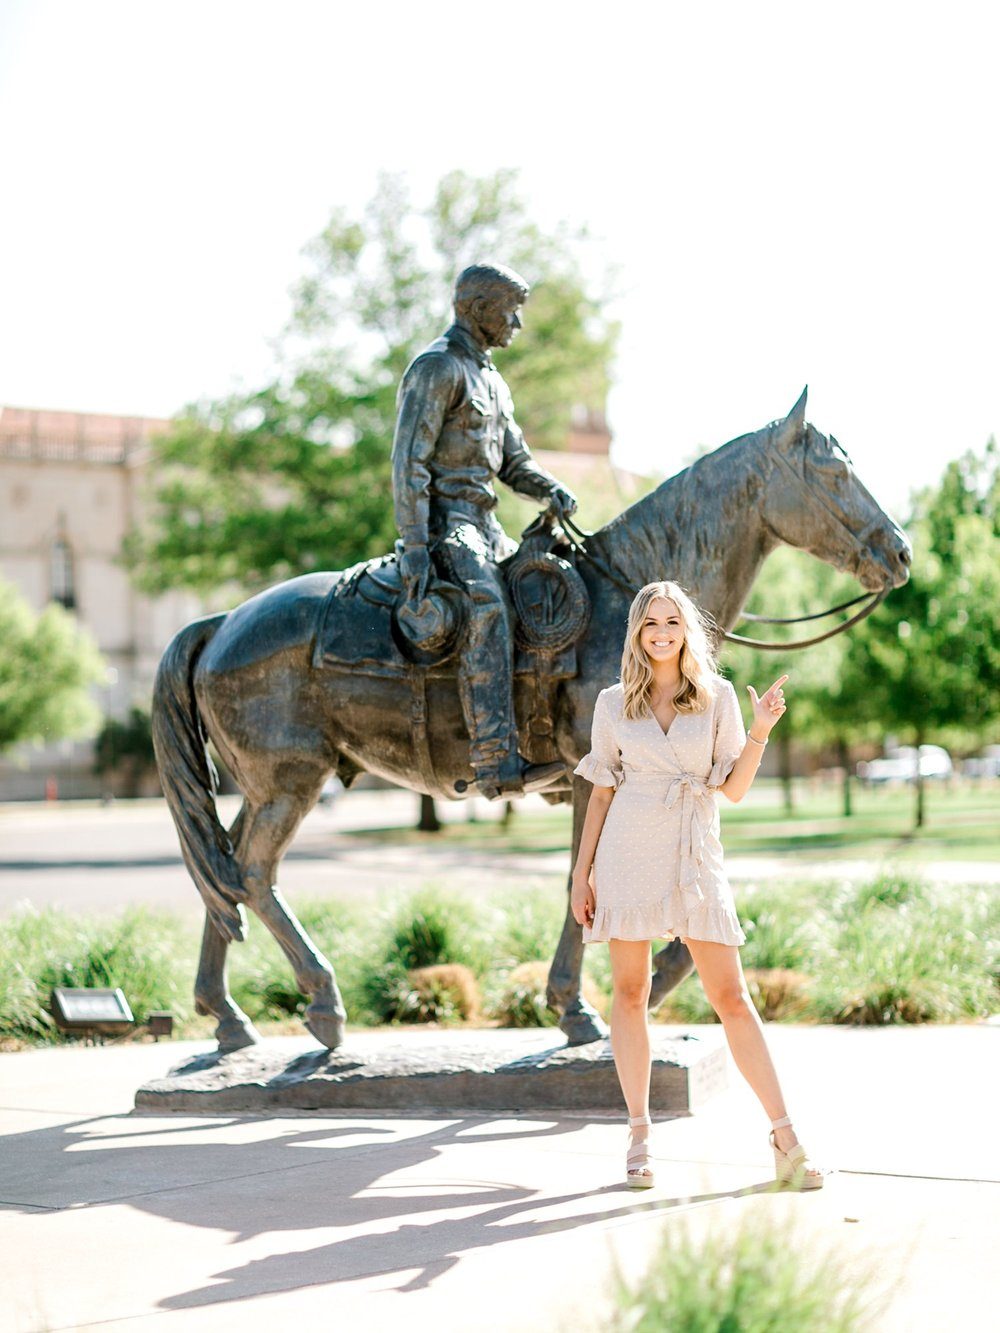 Darby_Atwood_ALLEEJ_Lubbock_Senior_Photographer_Texas_Tech_University_0006.jpg